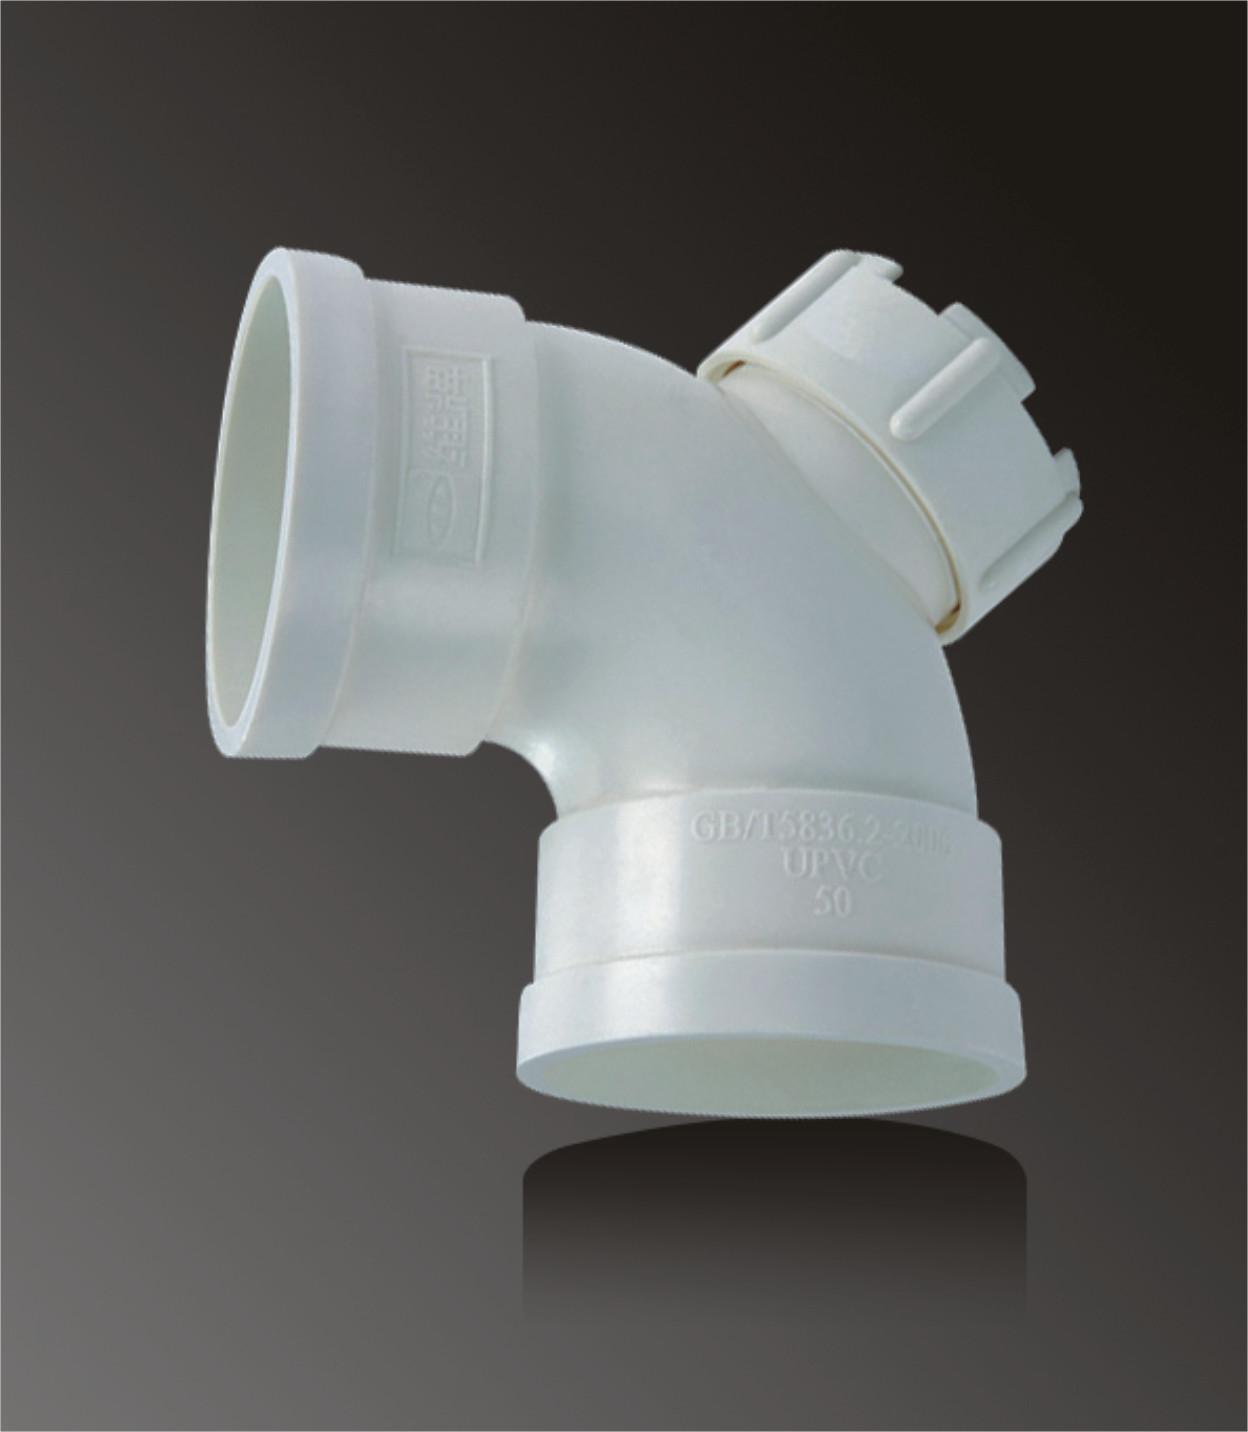 Germany standard large diameter pvc eblowvc elbow